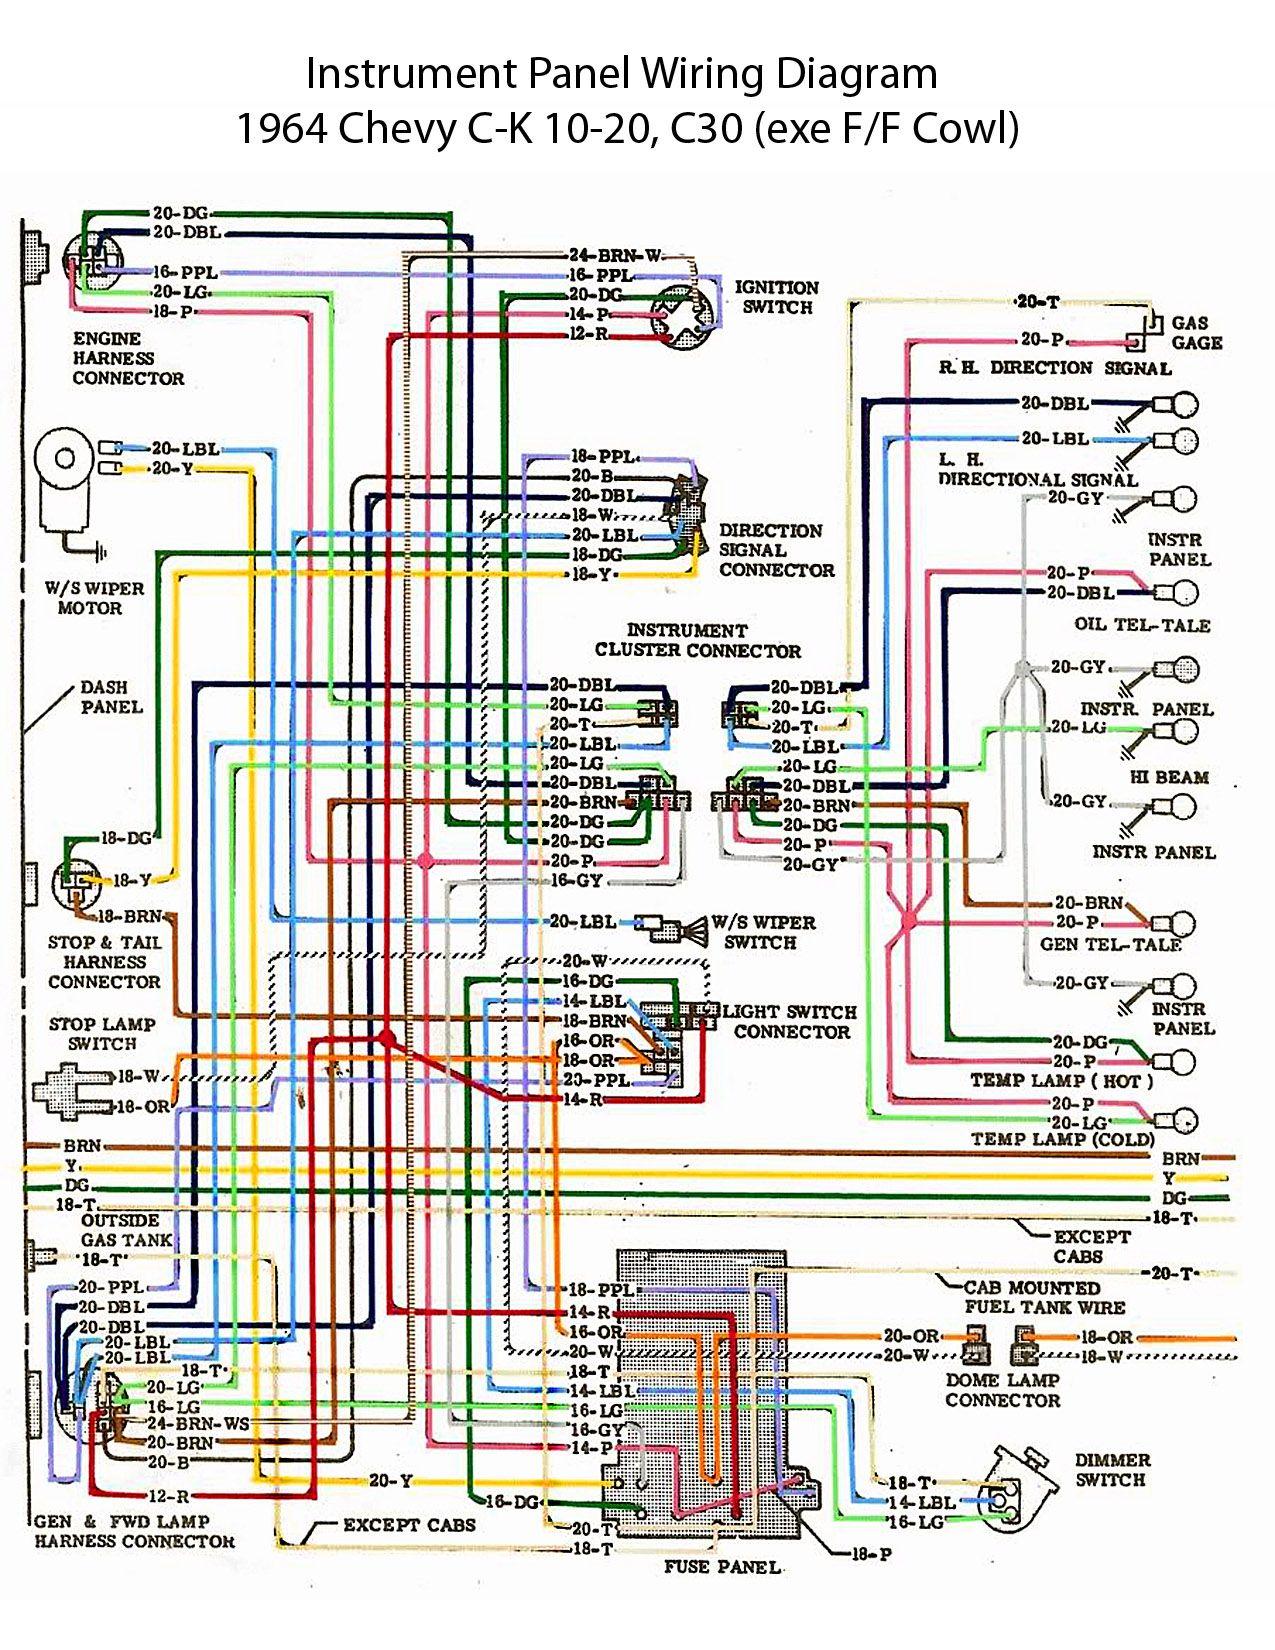 hight resolution of 29f907bf017db832106977dbff5b5b31 64 chevy c10 wiring diagram chevy truck wiring diagram 64 2004 silverado tail light wiring